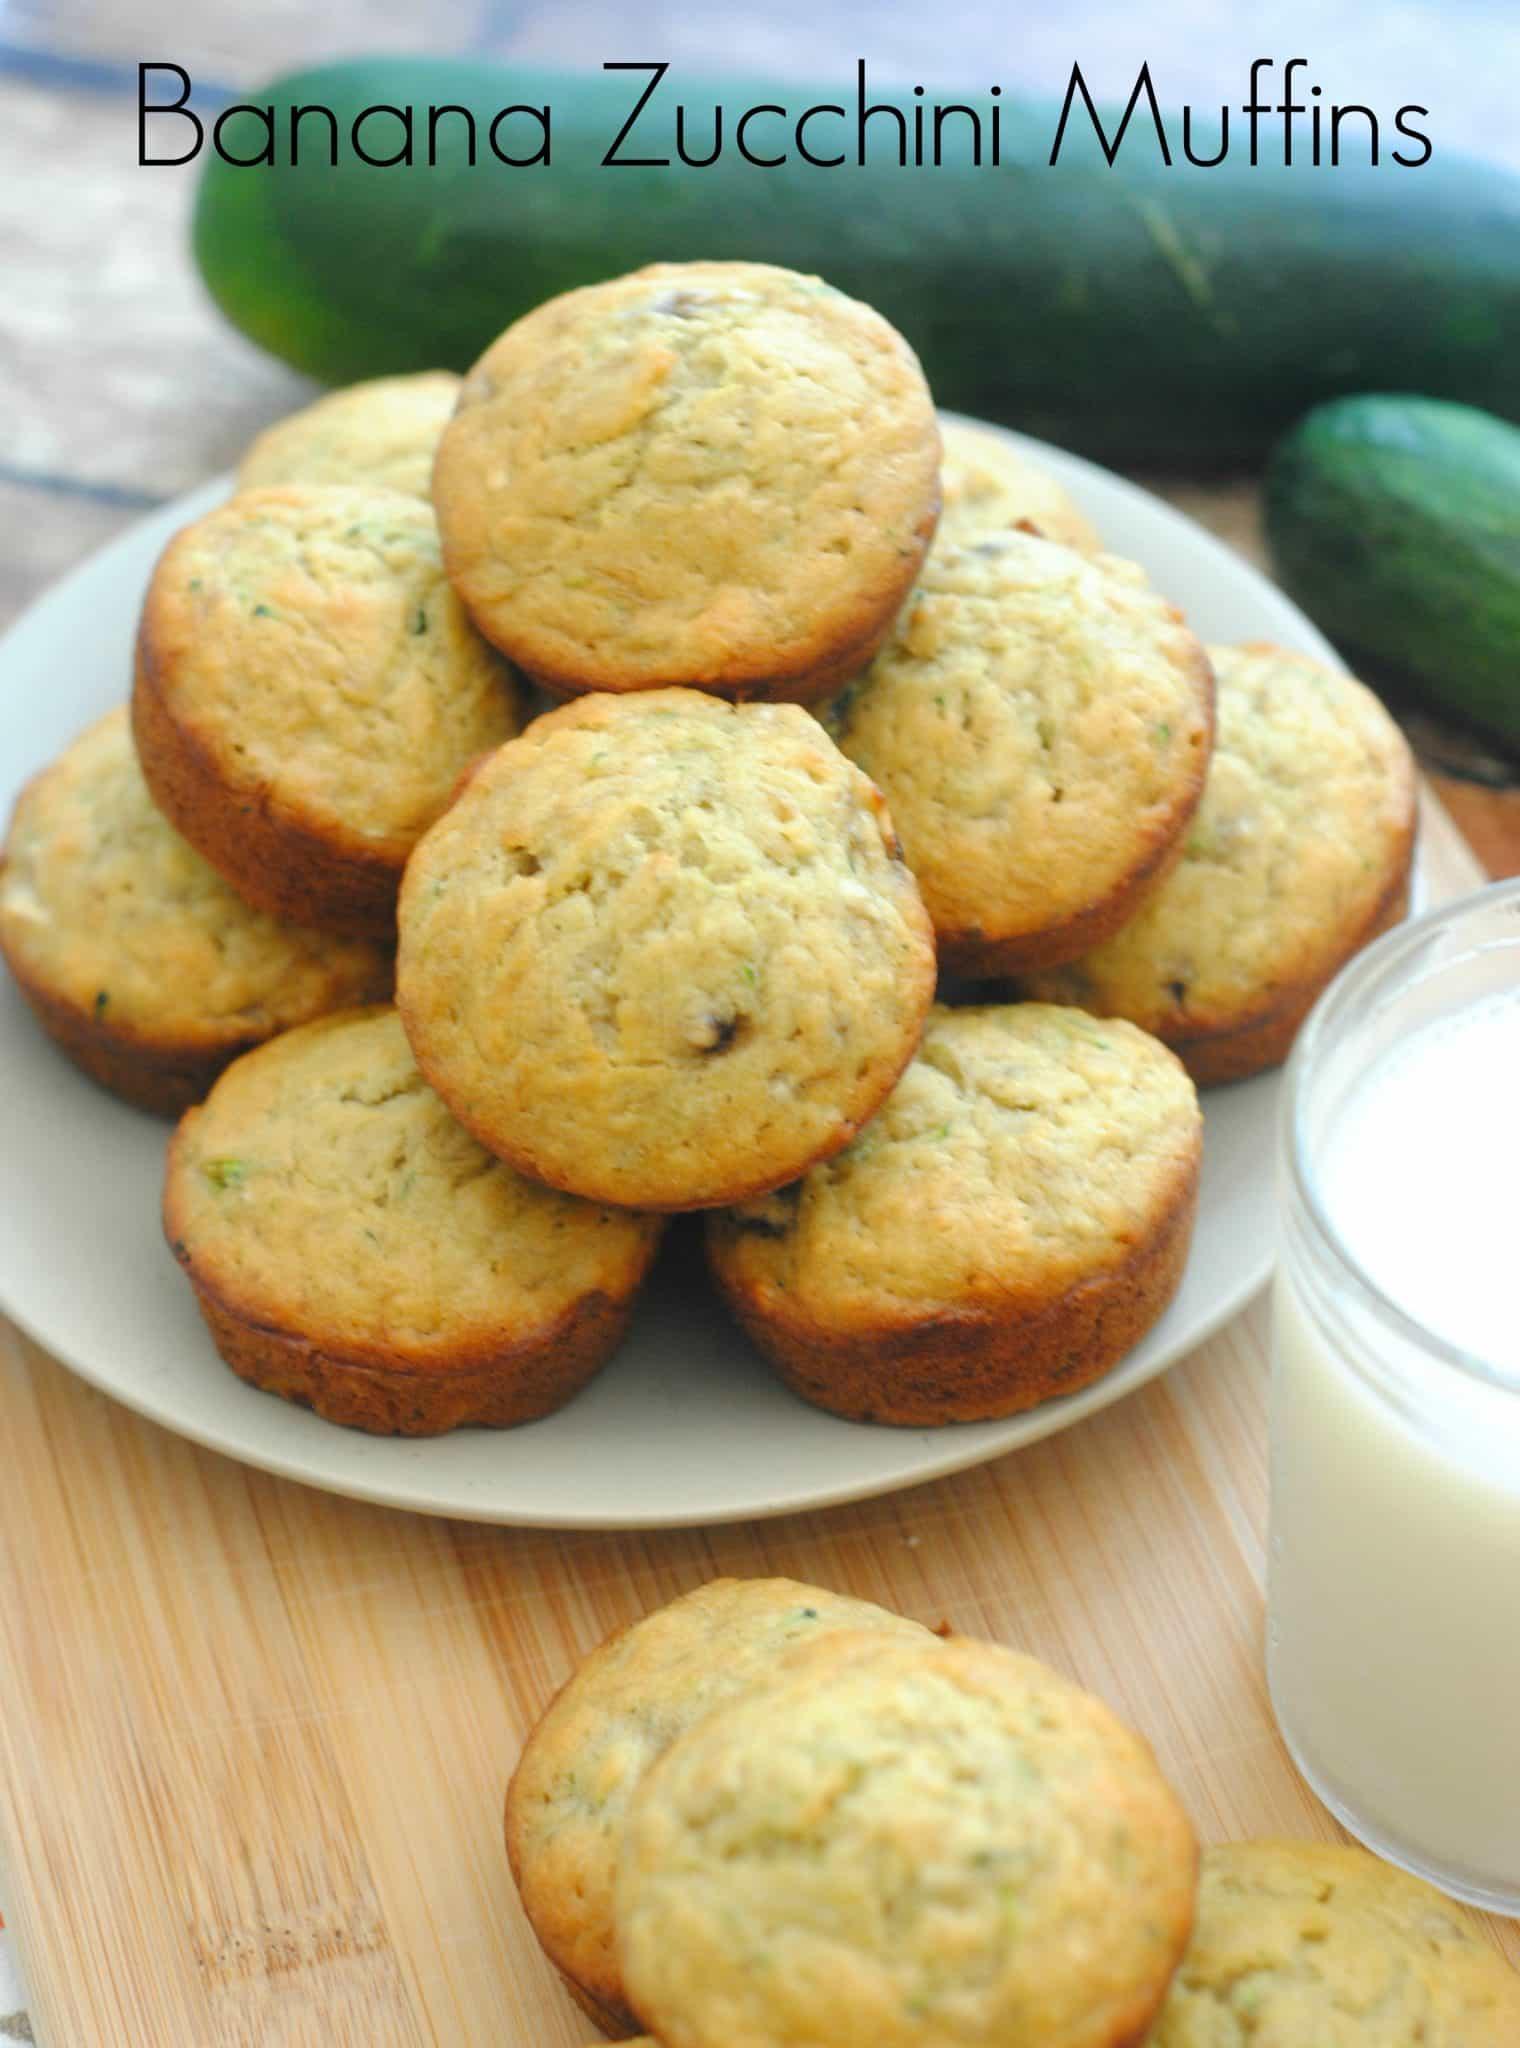 Banana Zucchini Muffins | Life with Heidi